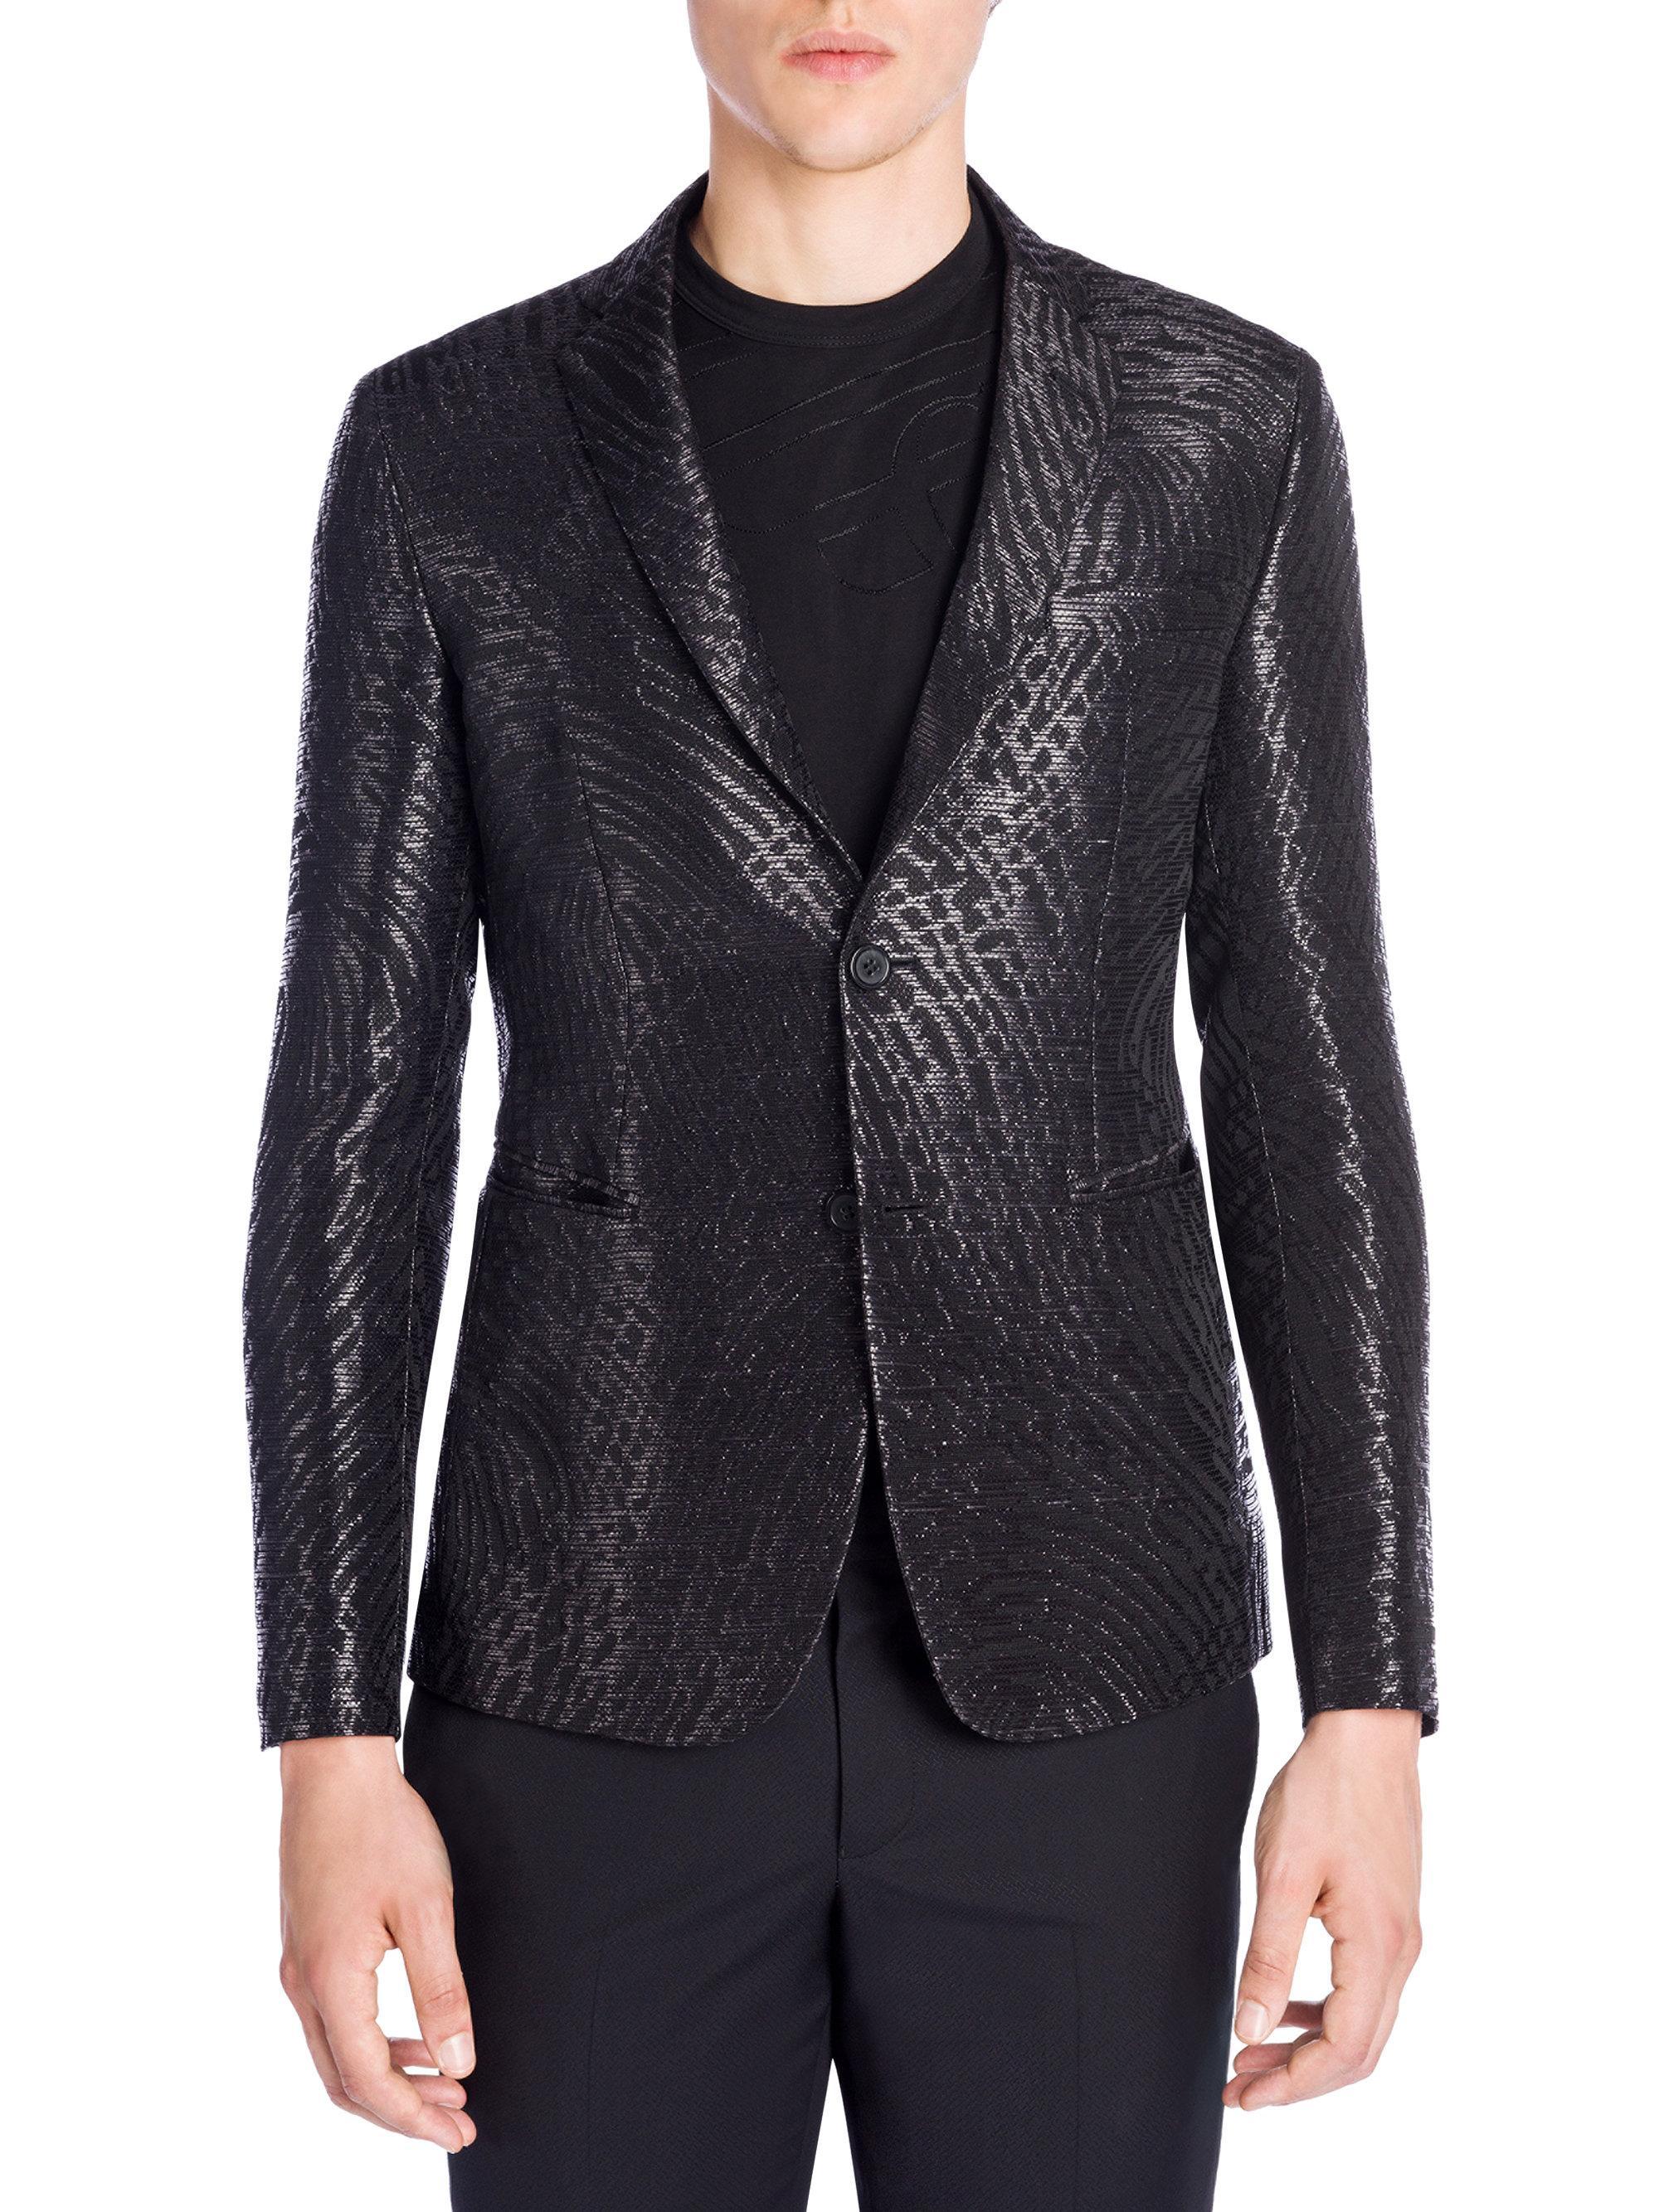 Mens jacket brooch - Emporio Armani Giacca Jacquard Pattern Jacket Lyst